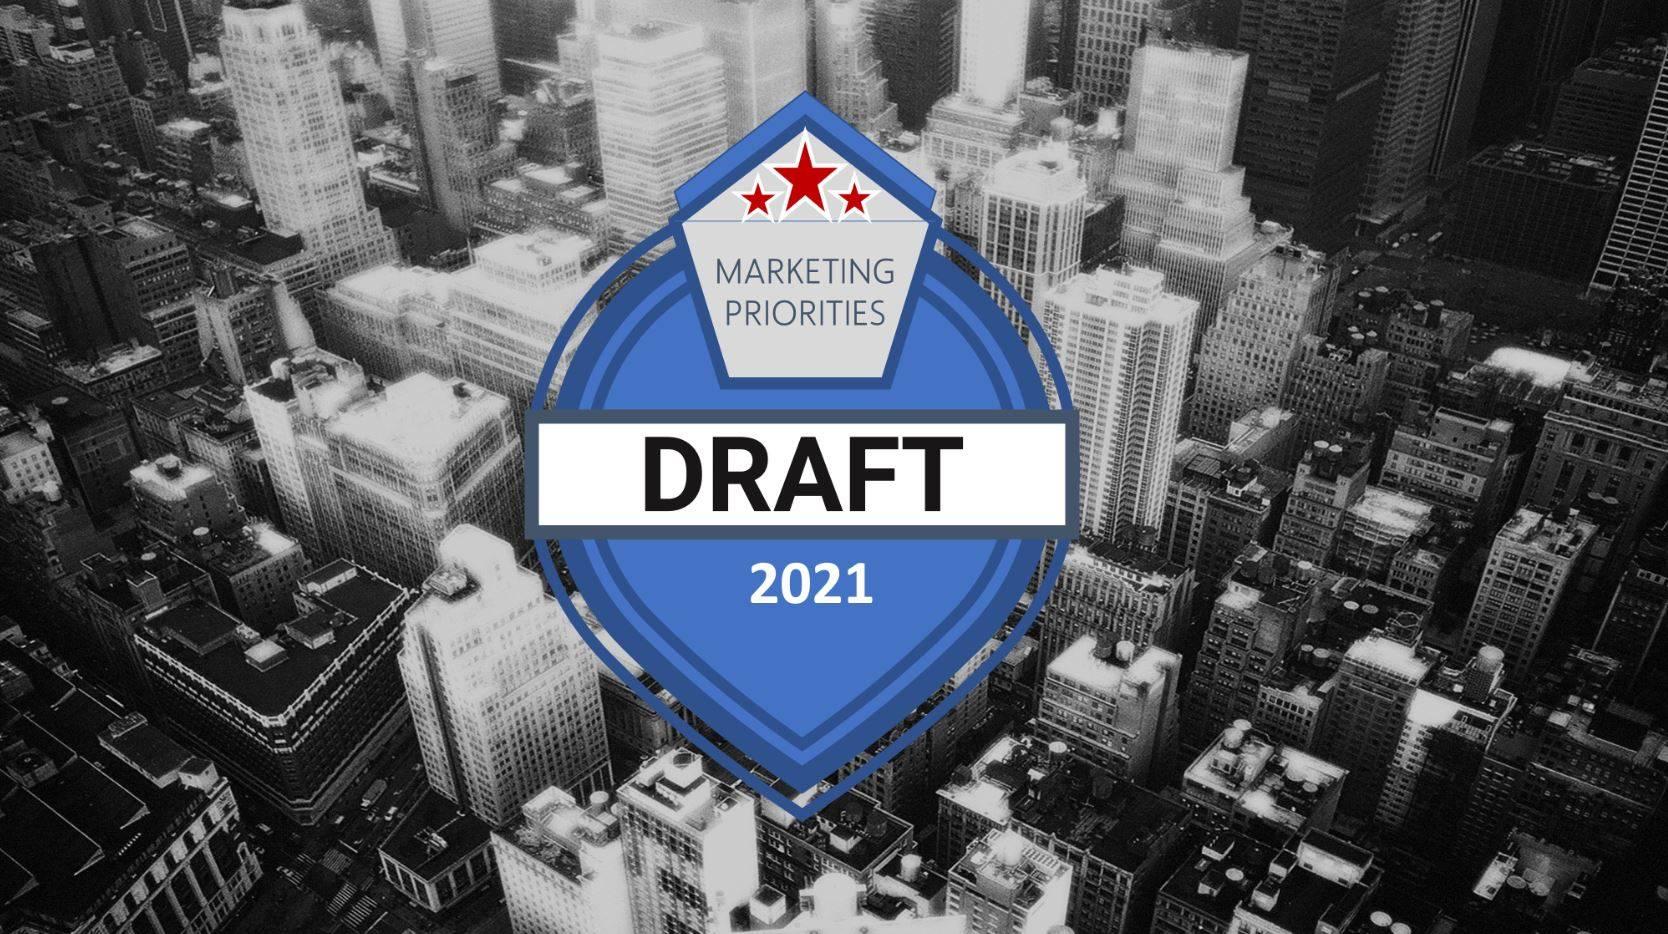 Marketing Priorities Draft